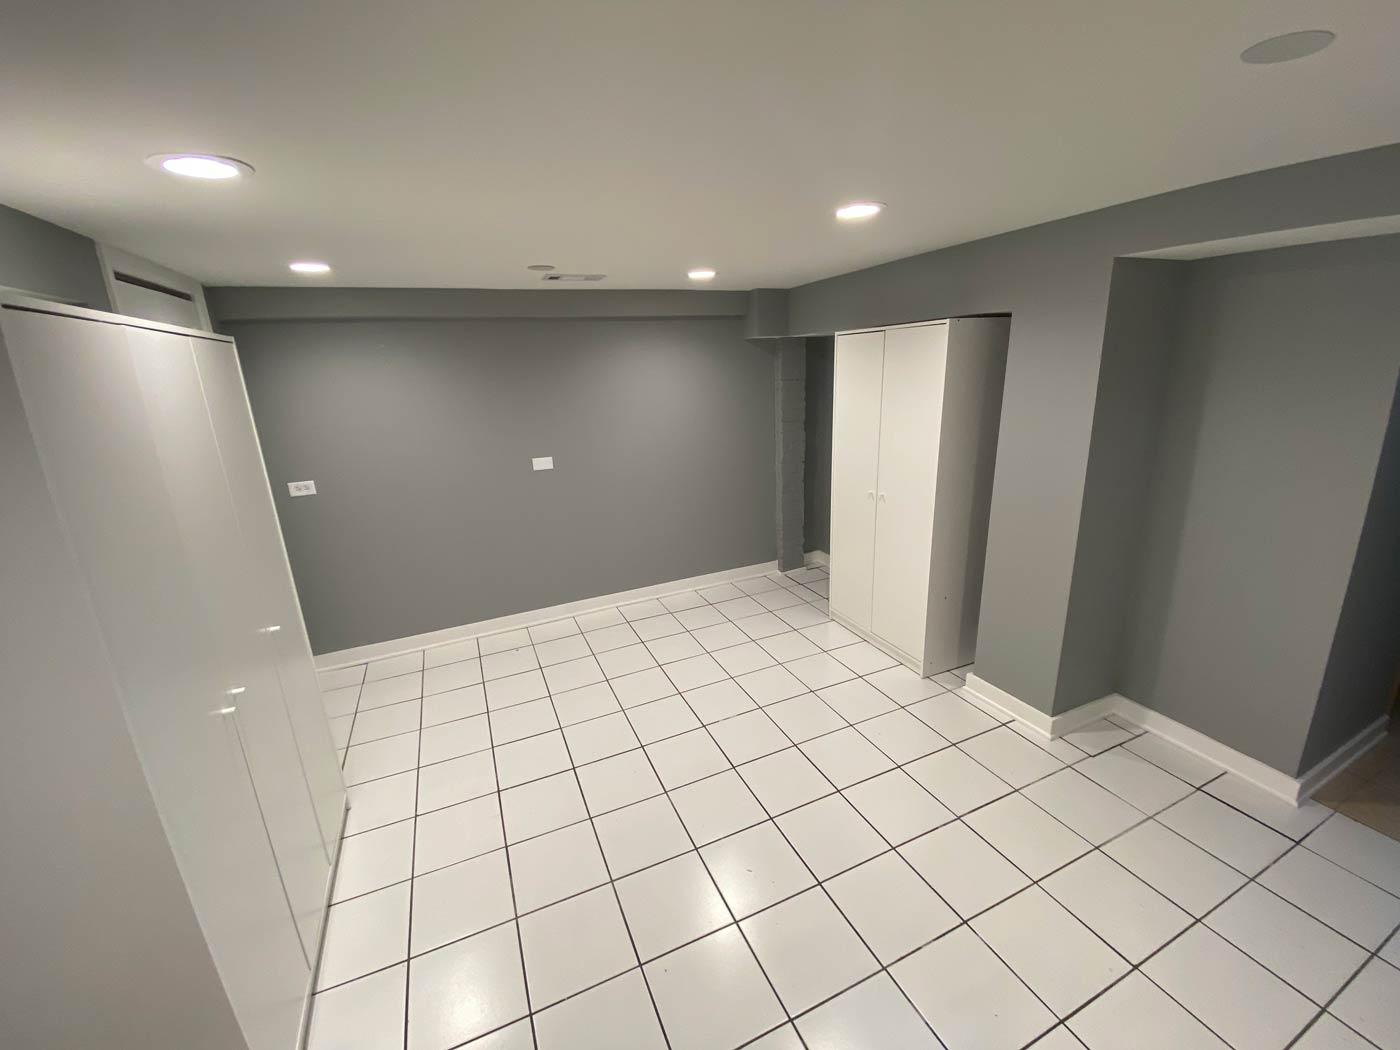 Basement renovation in Mount Prospect